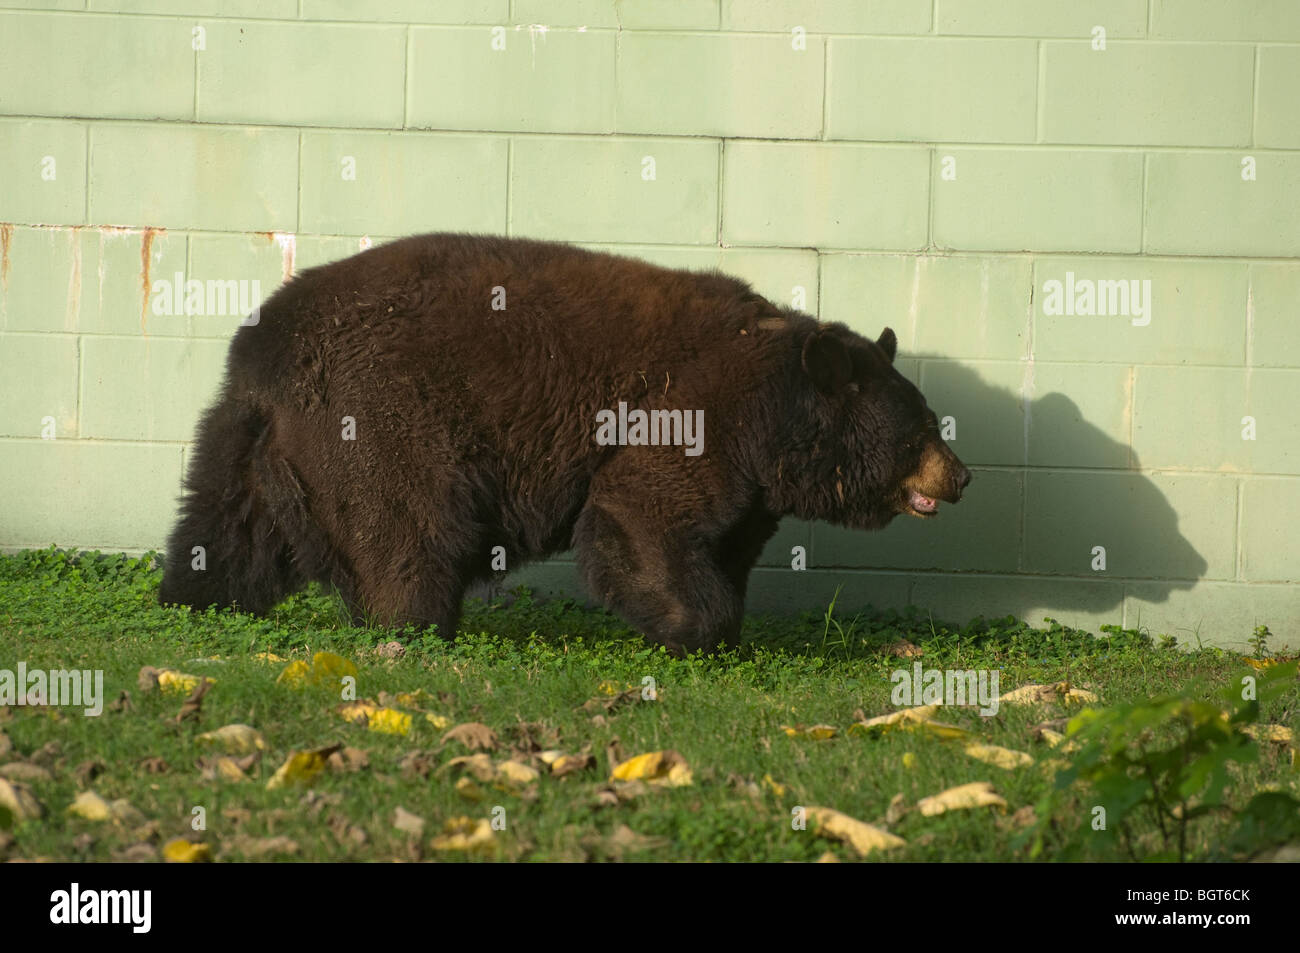 North American Black Bear Ursus Americanus in captivity Silver Springs Florida tourist tourism attraction Stock Photo